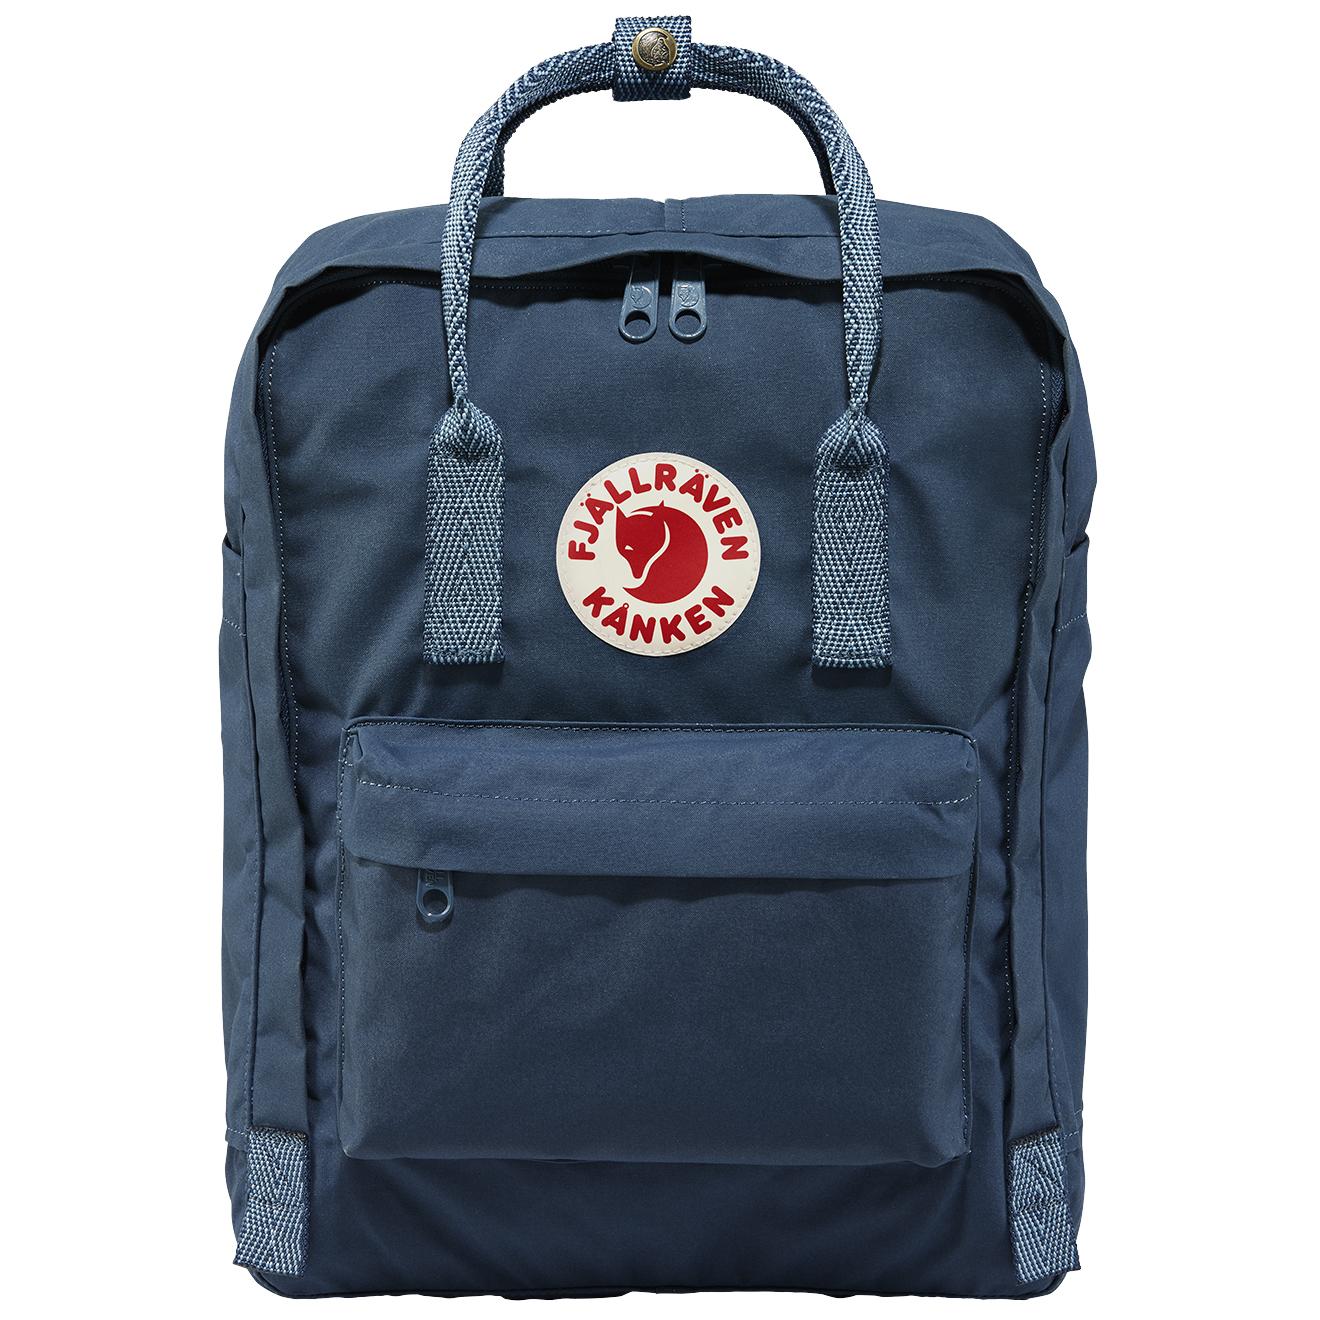 1888c583c Fjallraven Kanken Classic Backpack Royal Blue / Goose Eye - The ...